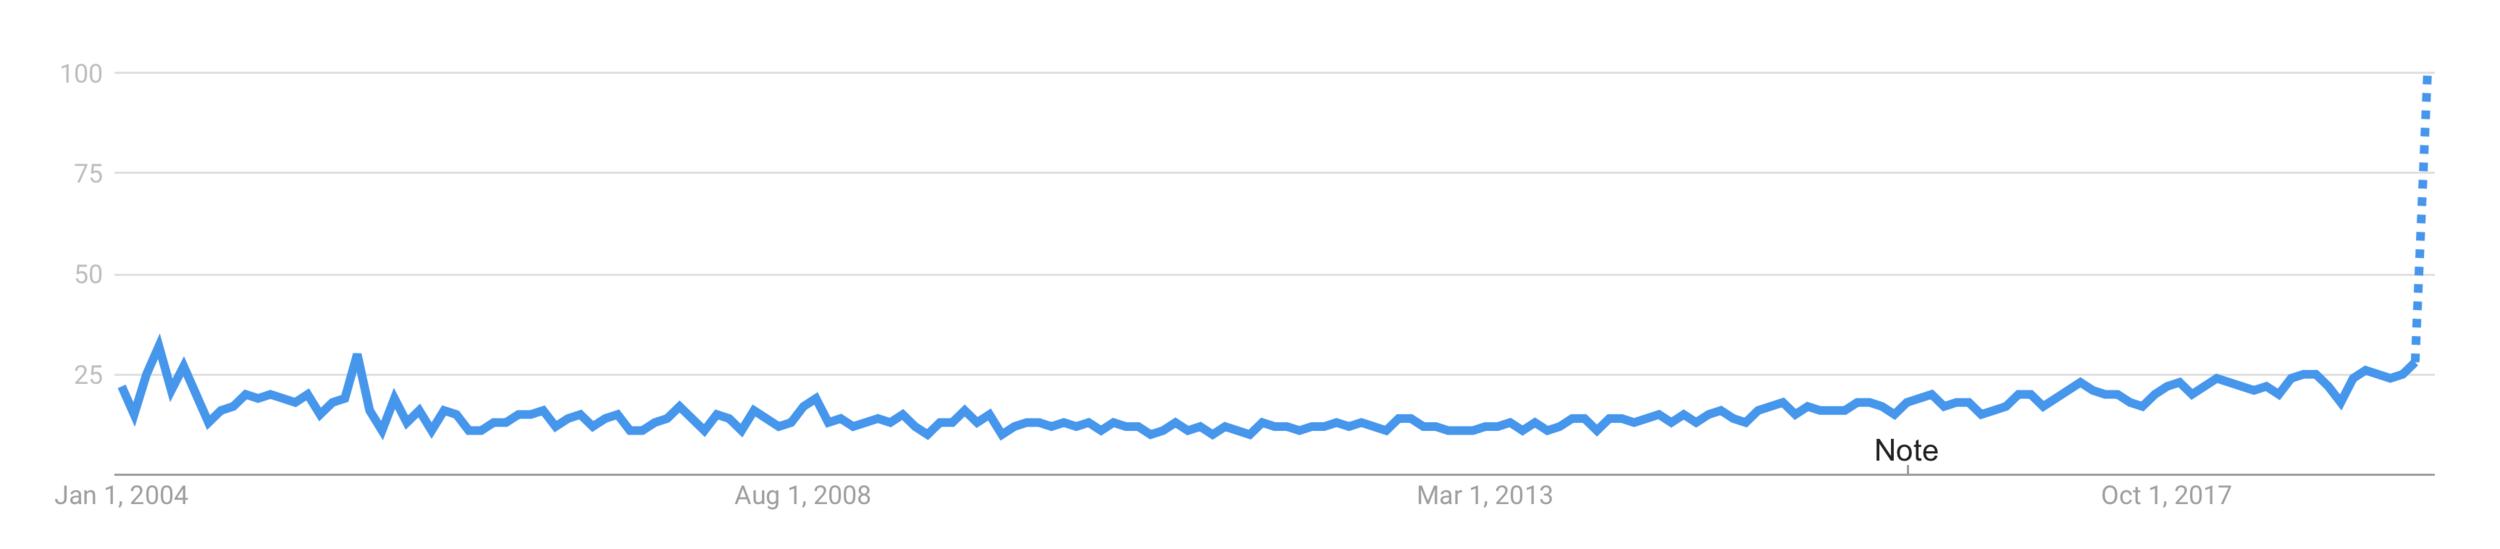 Product Design interest, Google Trends July 2019